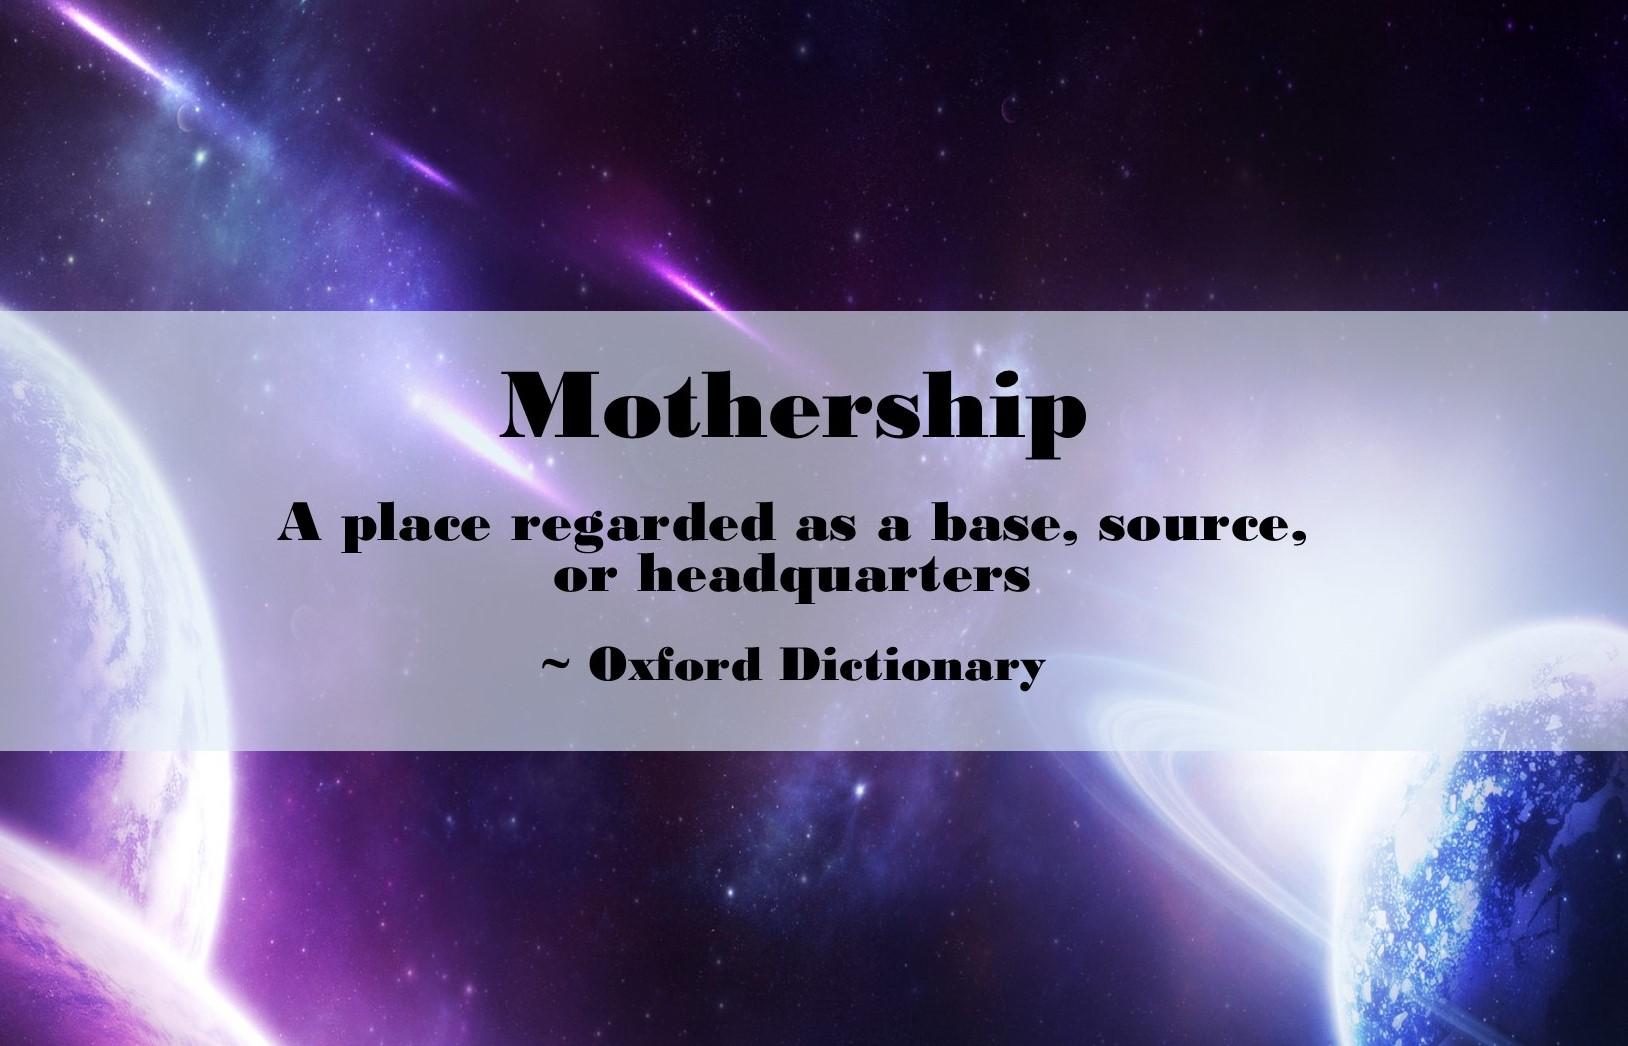 Mothership 2